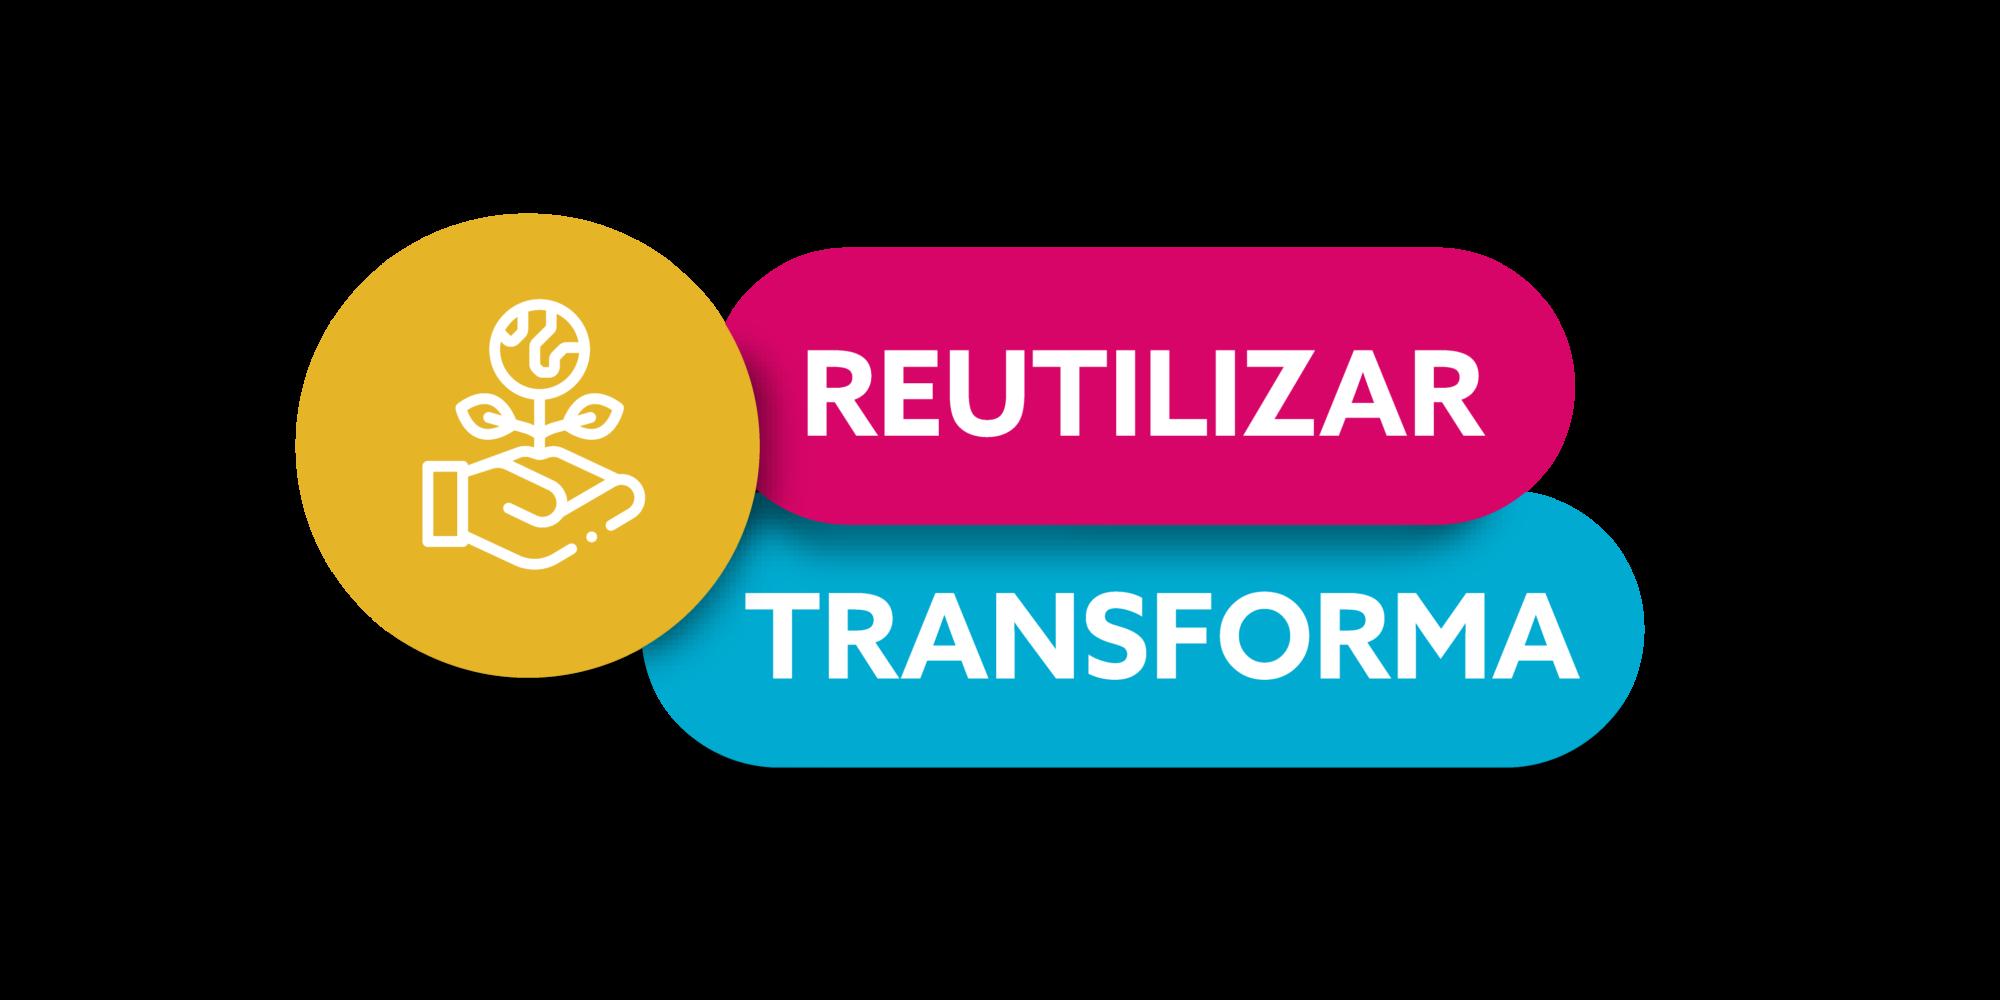 reutilizar transforma upcycling lixiki